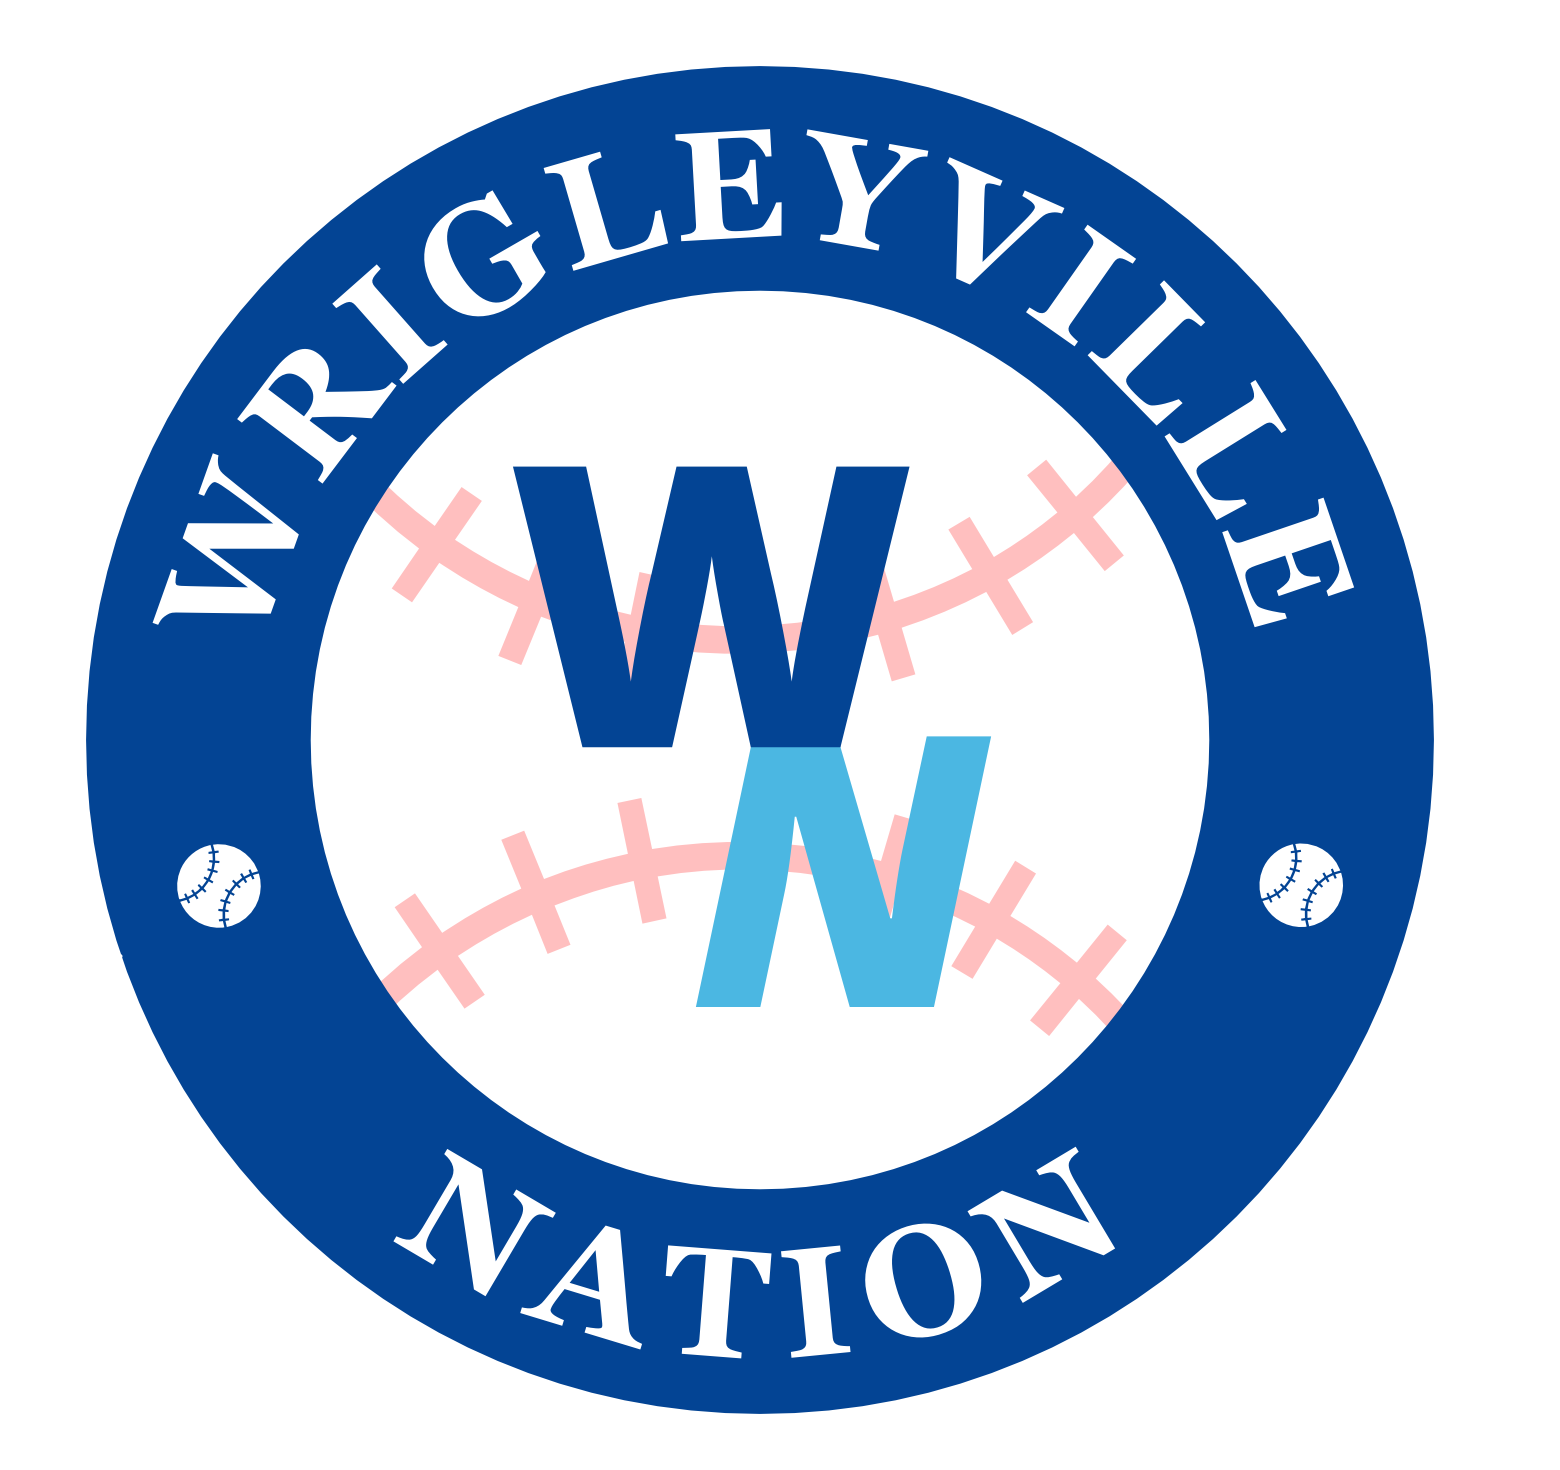 Wrigleyville Nation Ep 238 - Guest: Dan Szymborski, Darvish Traded, Cubs Zips Projections, & More show art